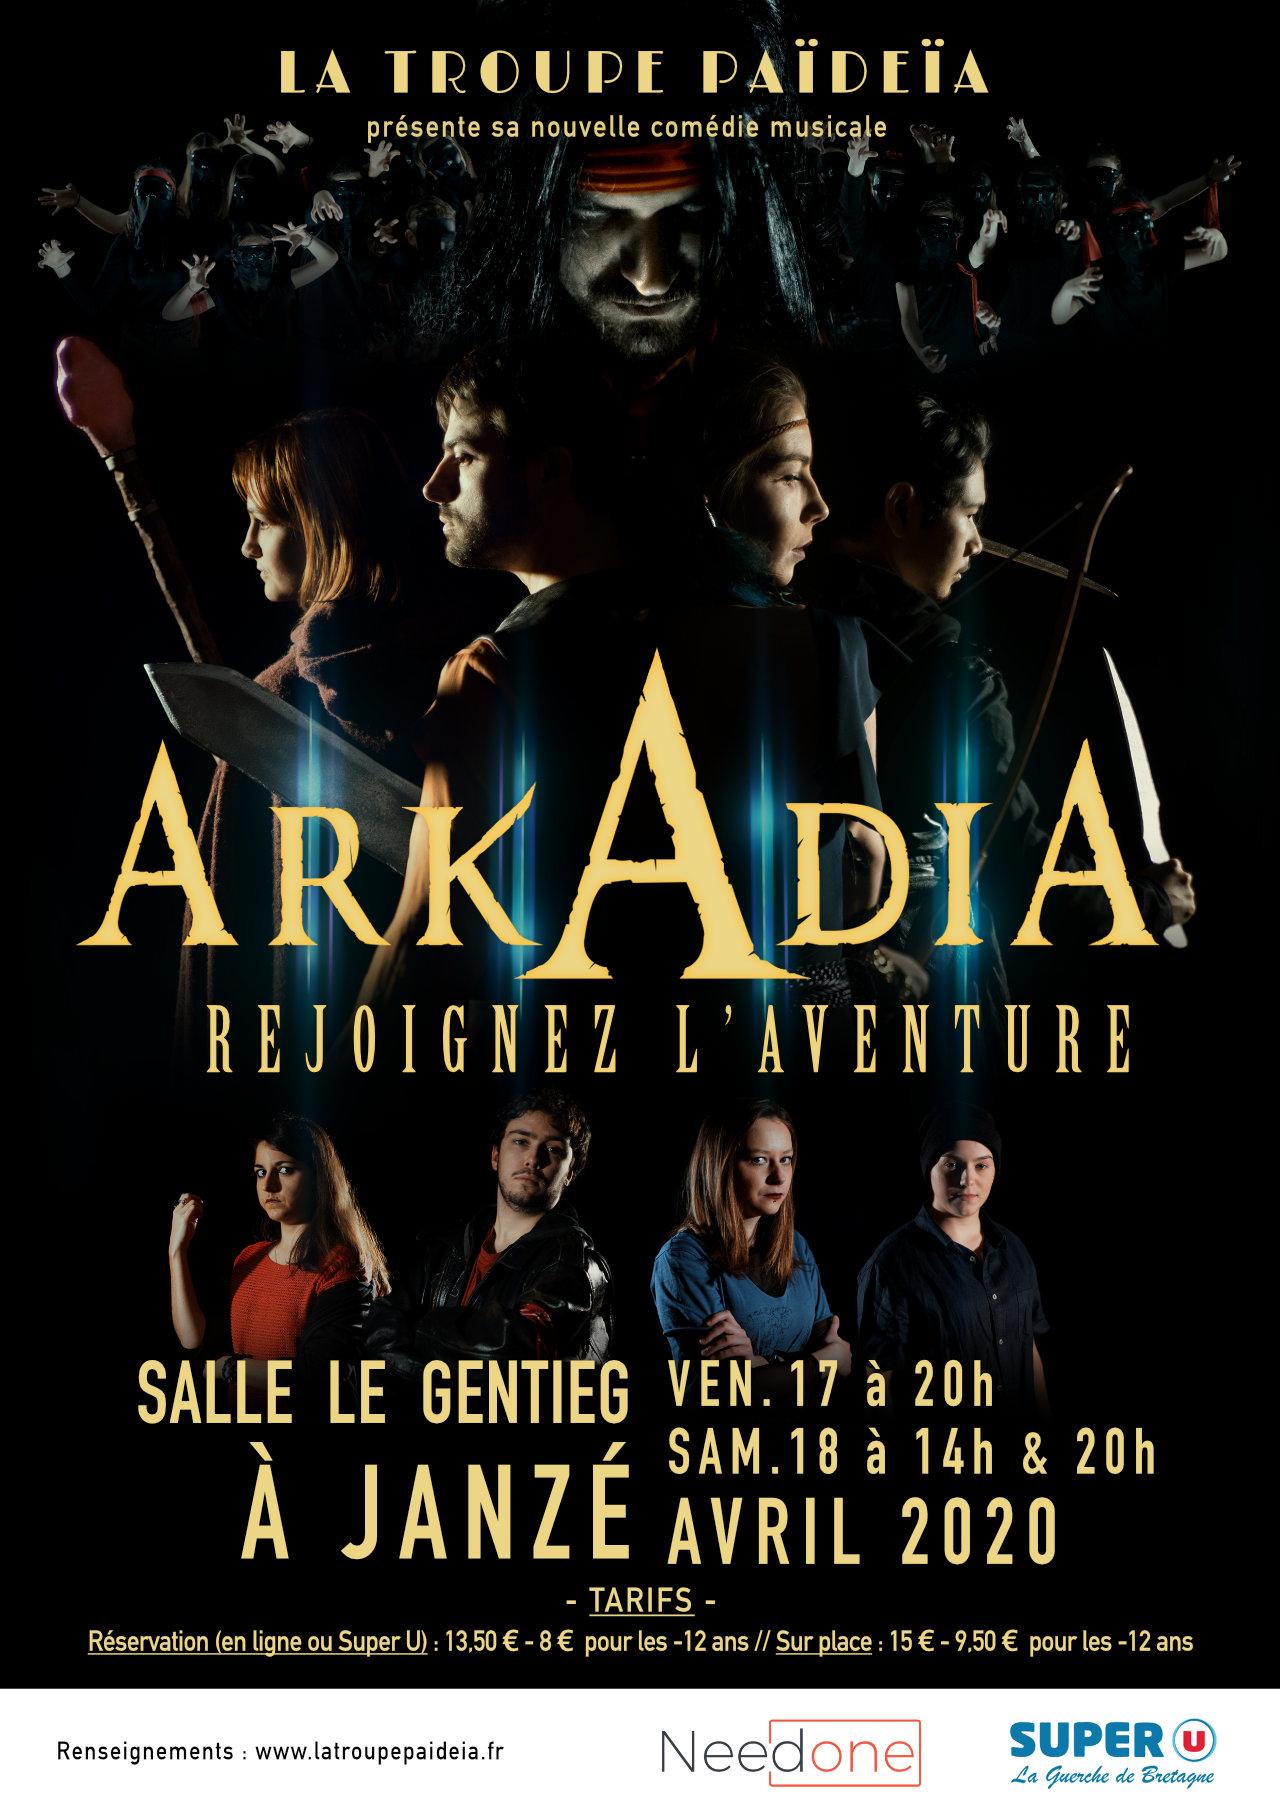 Arkadia, rejoignez l'aventure - La Troupe Païdeïa